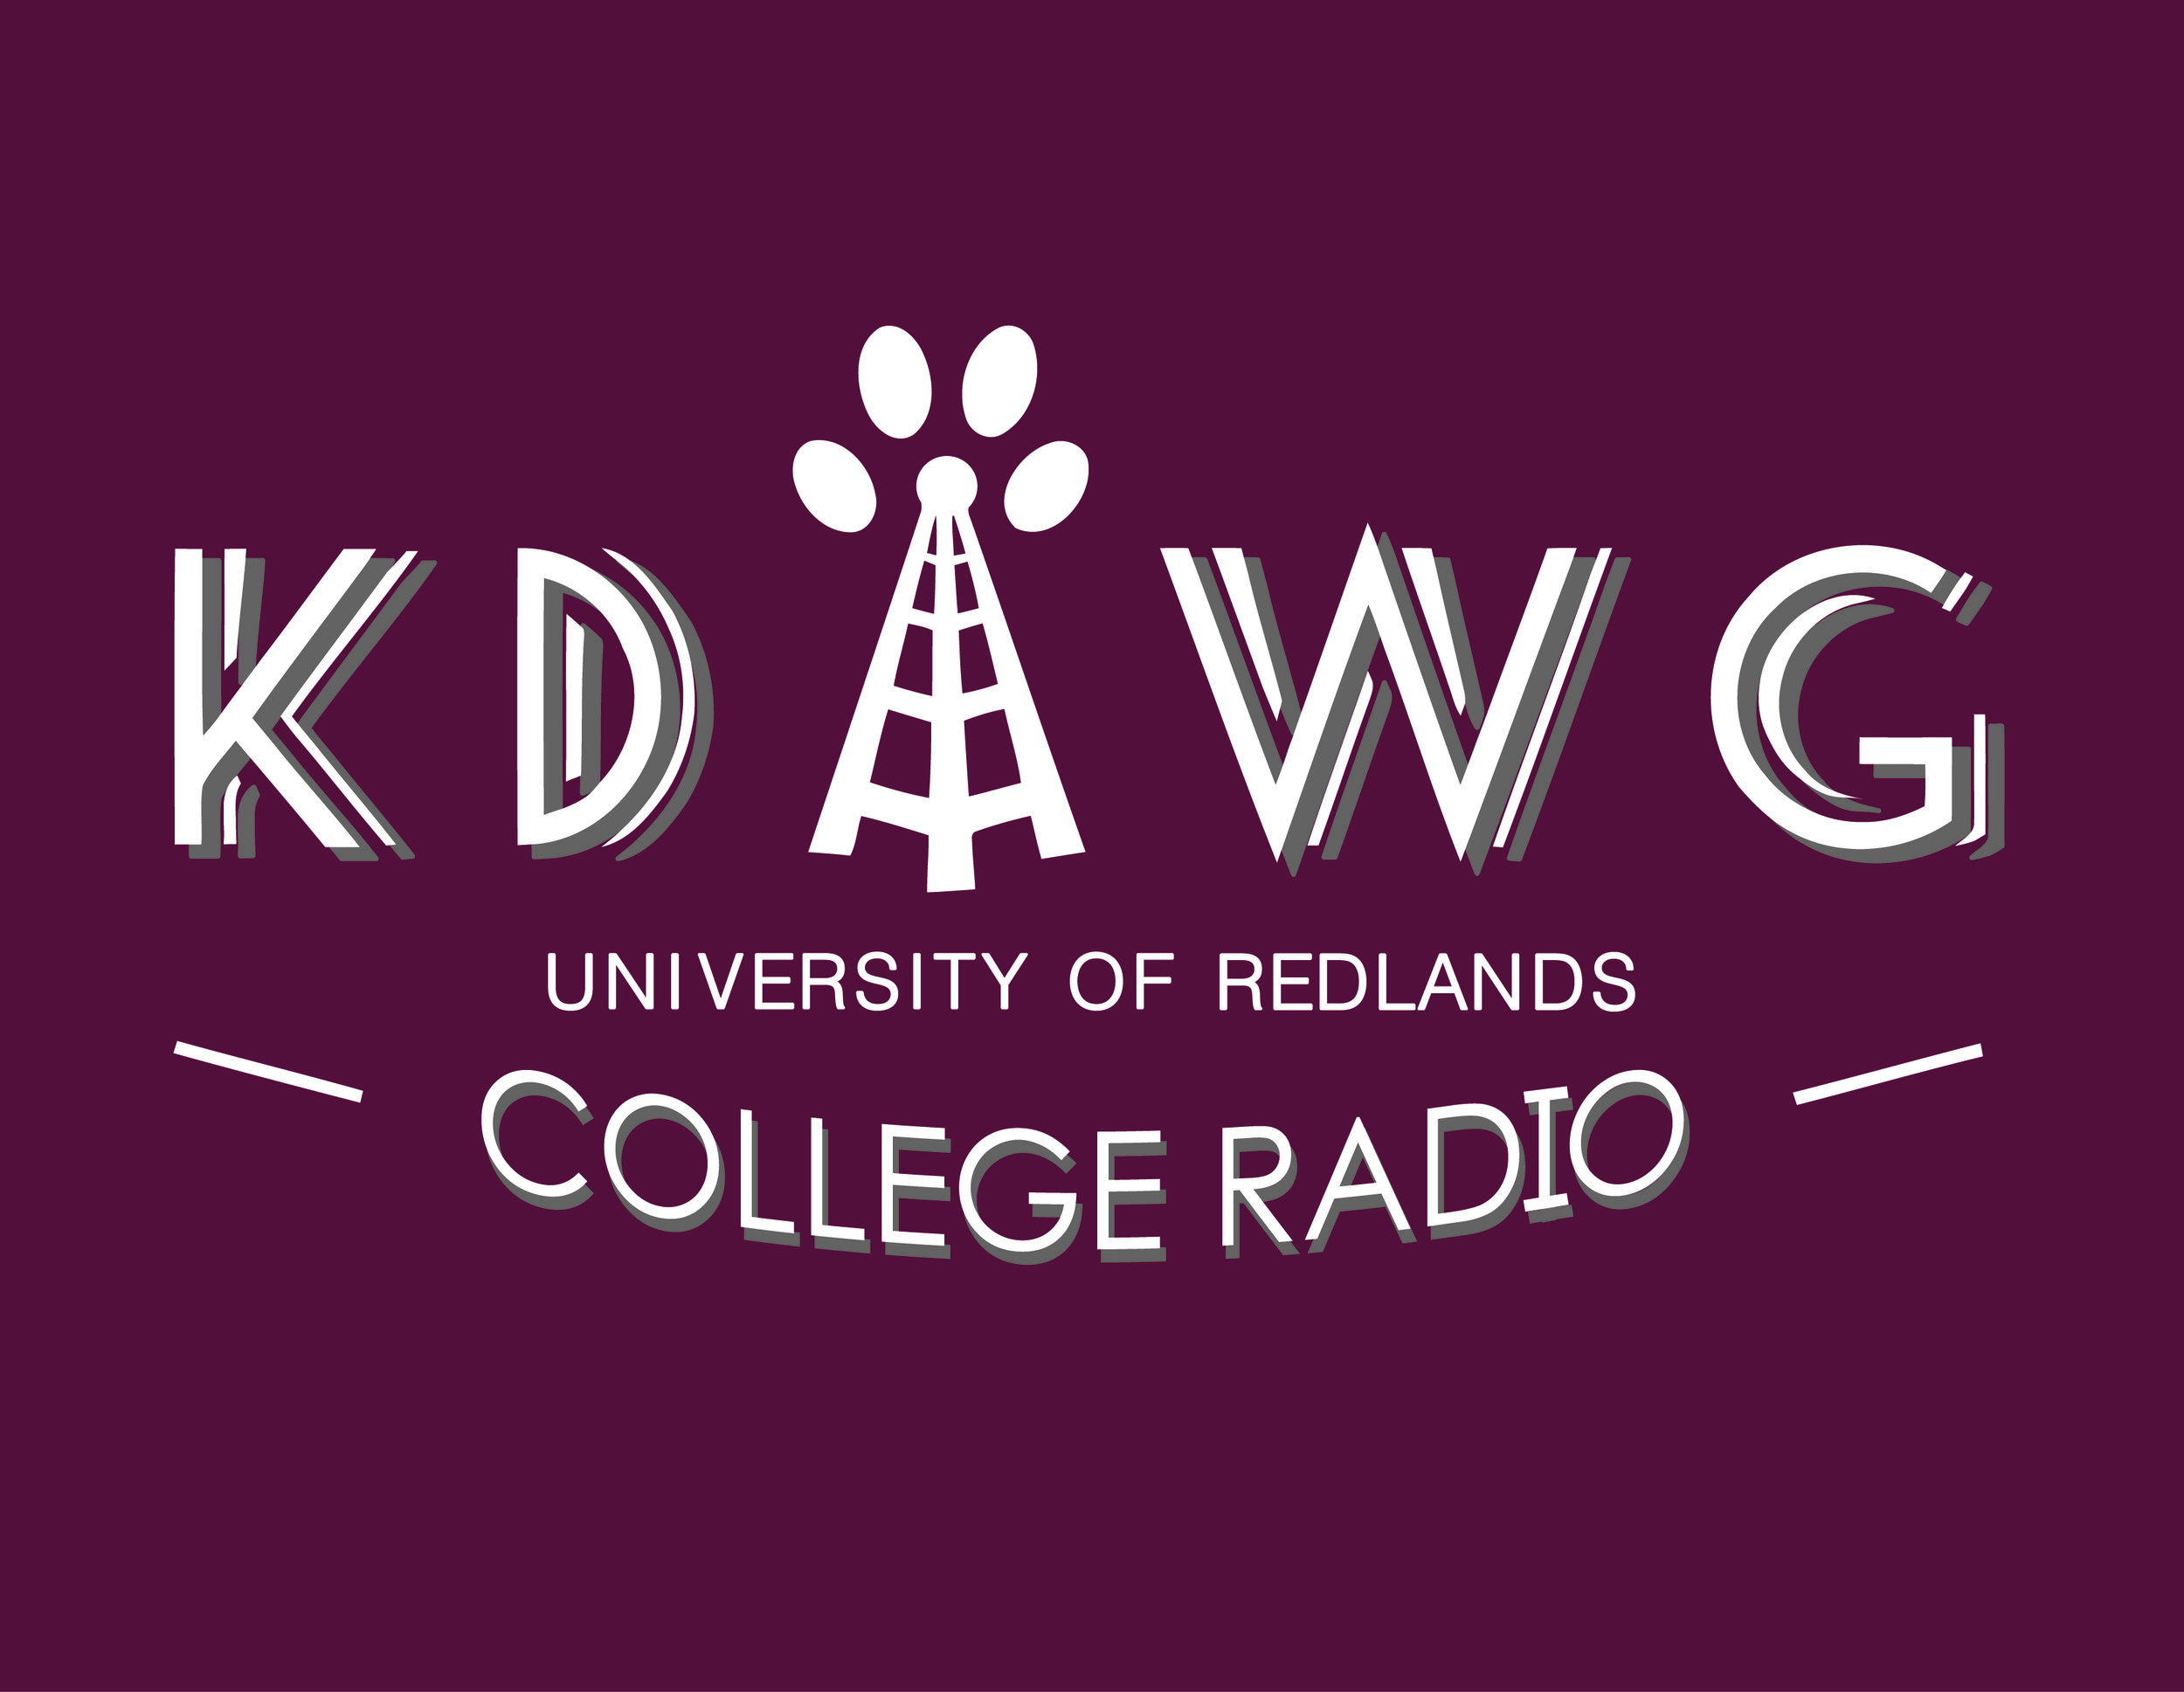 KDAWG Logo